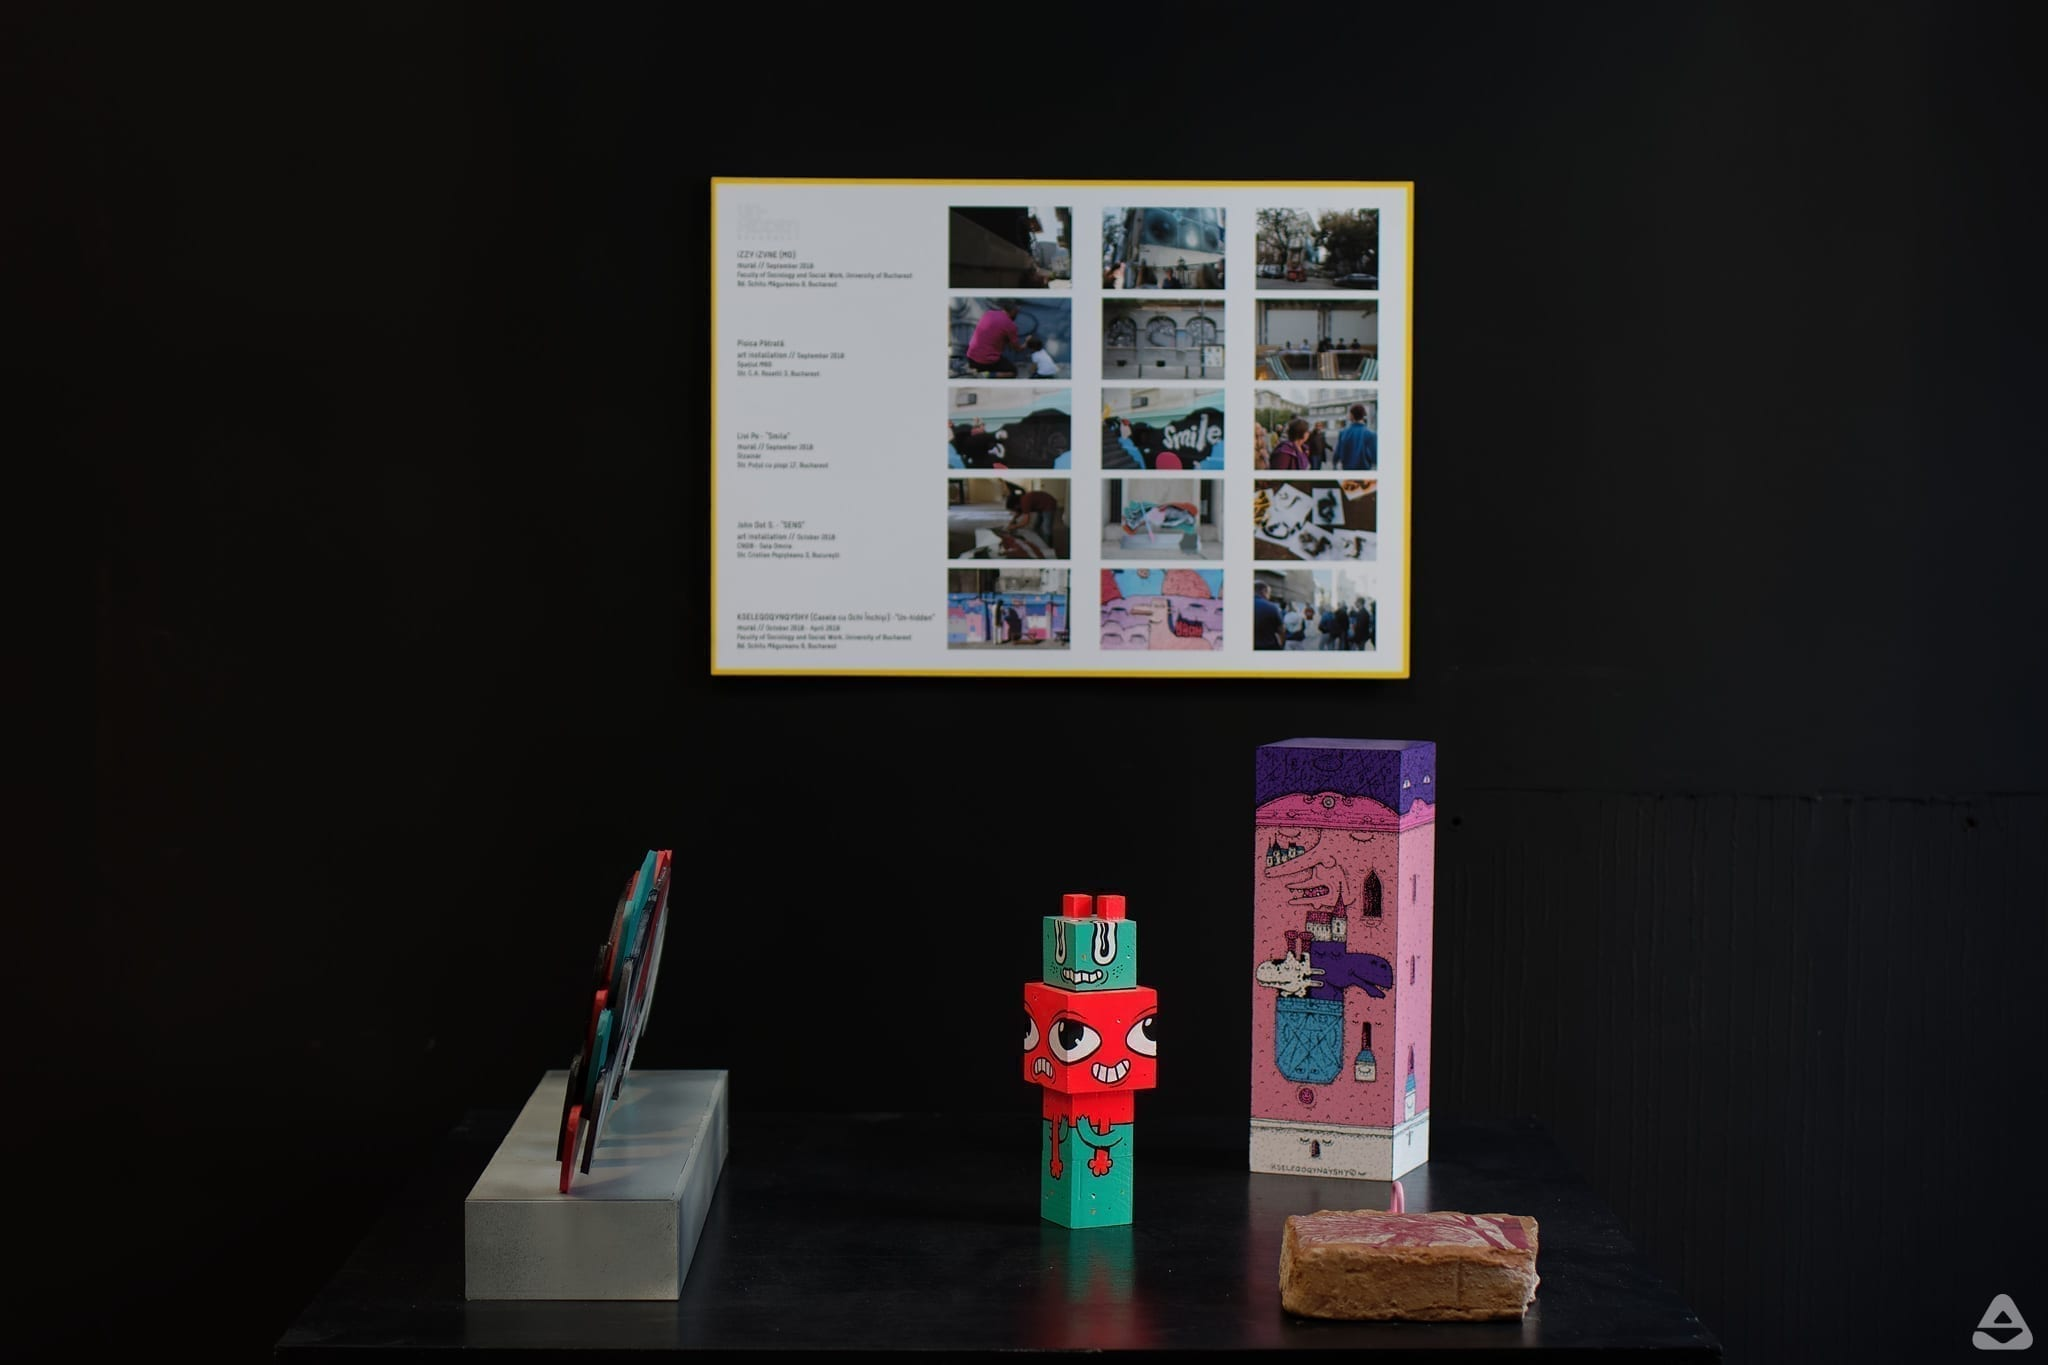 BTLT (Been There Liked That): feeder.ro at Romanian Design Week RDW 2019 Un-hidden Bucharest street art exhibition Save or Cancel